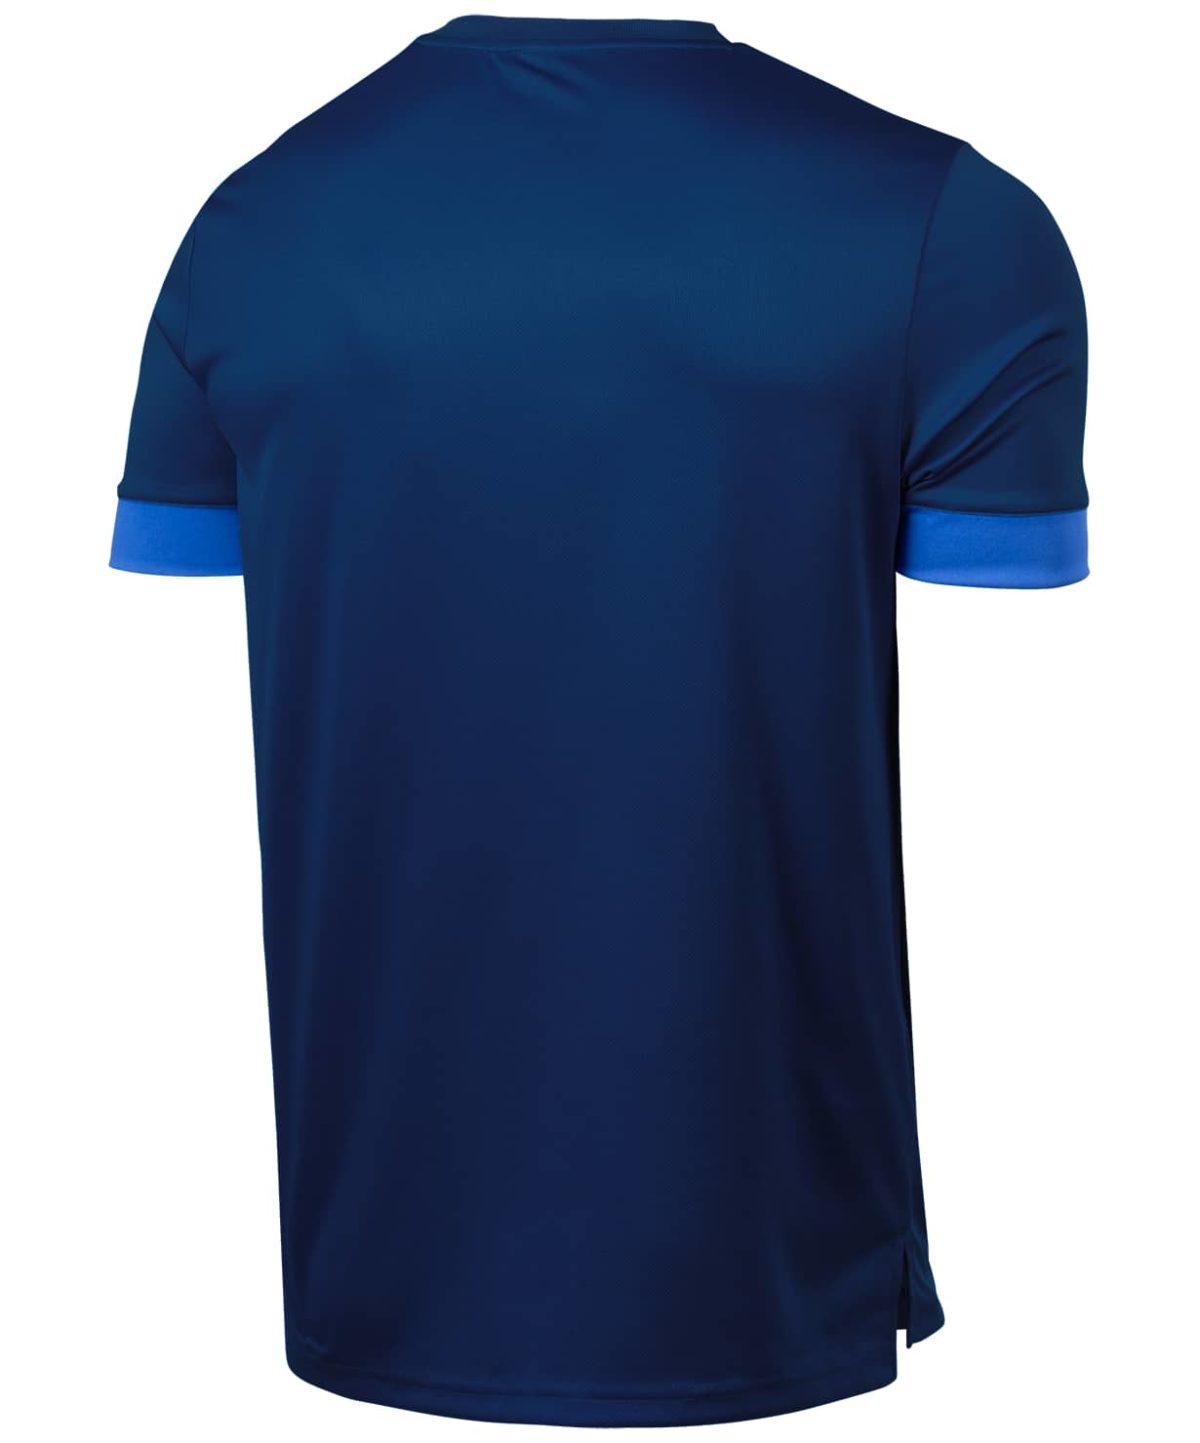 JOGEL DIVISION футболка футбольная Union Jersey: т.синий/синий/белый - 2